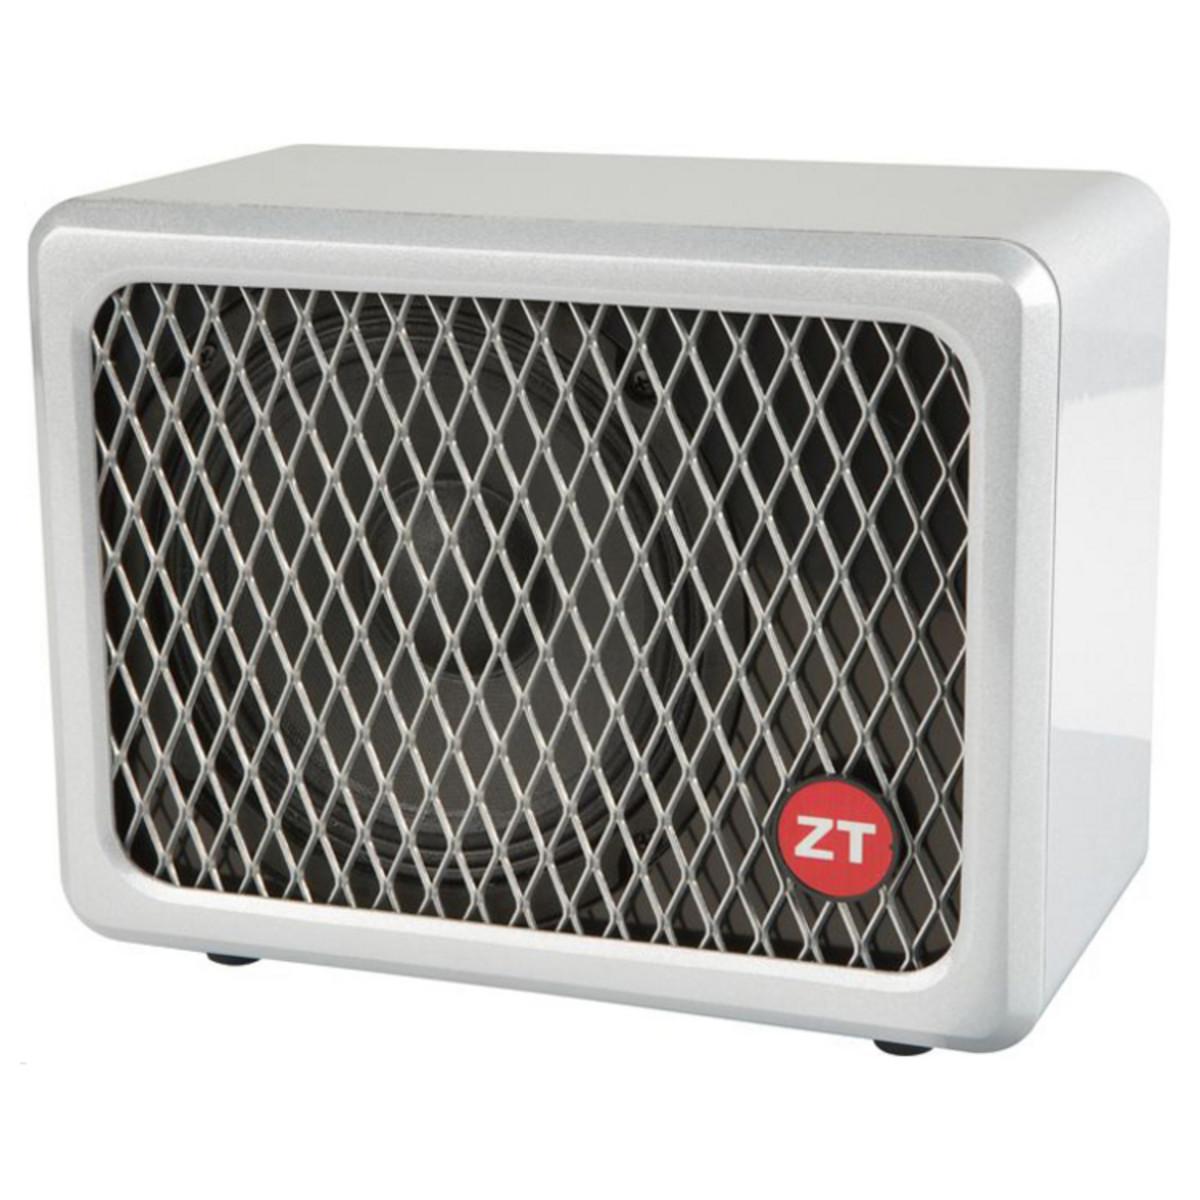 Zt Lunchbox Cab Extension Speaker Gear4music